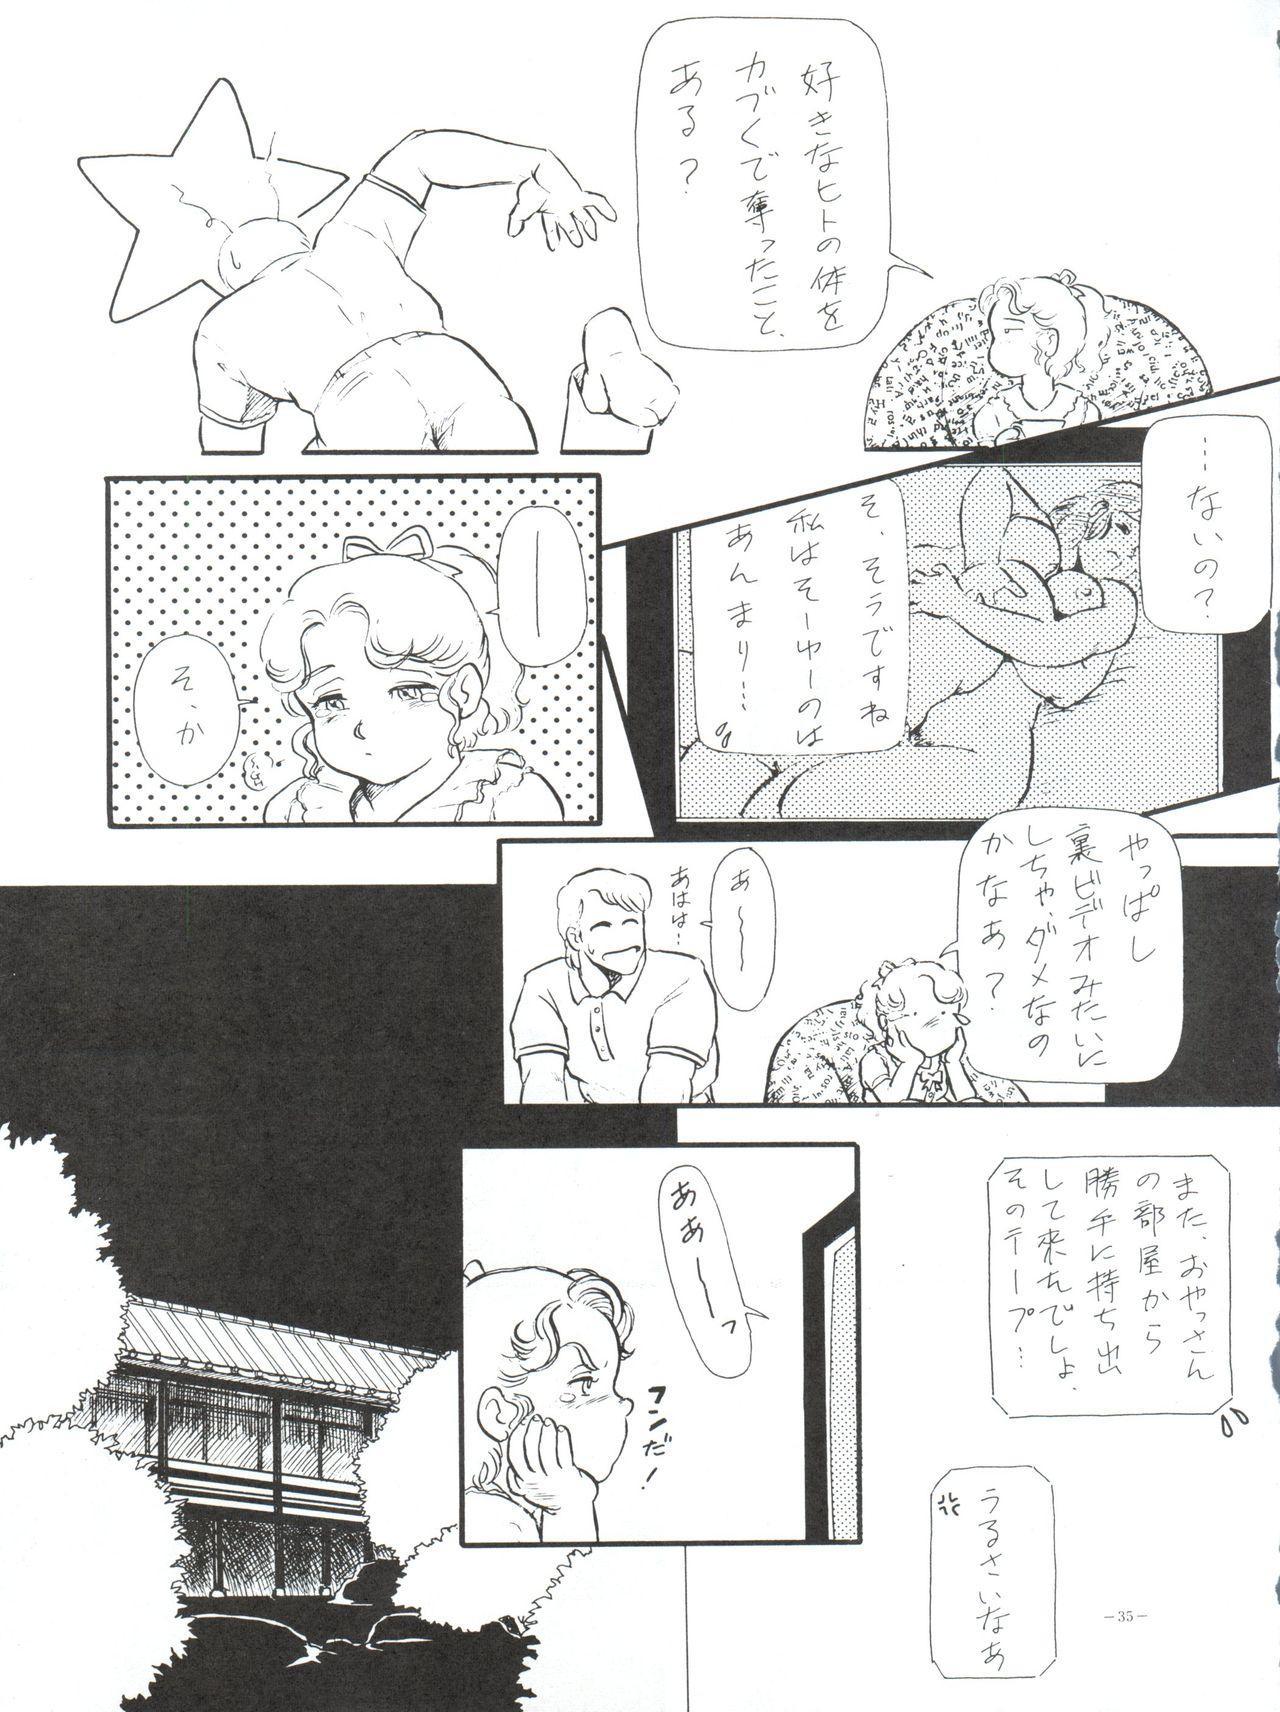 BLOOMAGAZINE Vol. 4 34